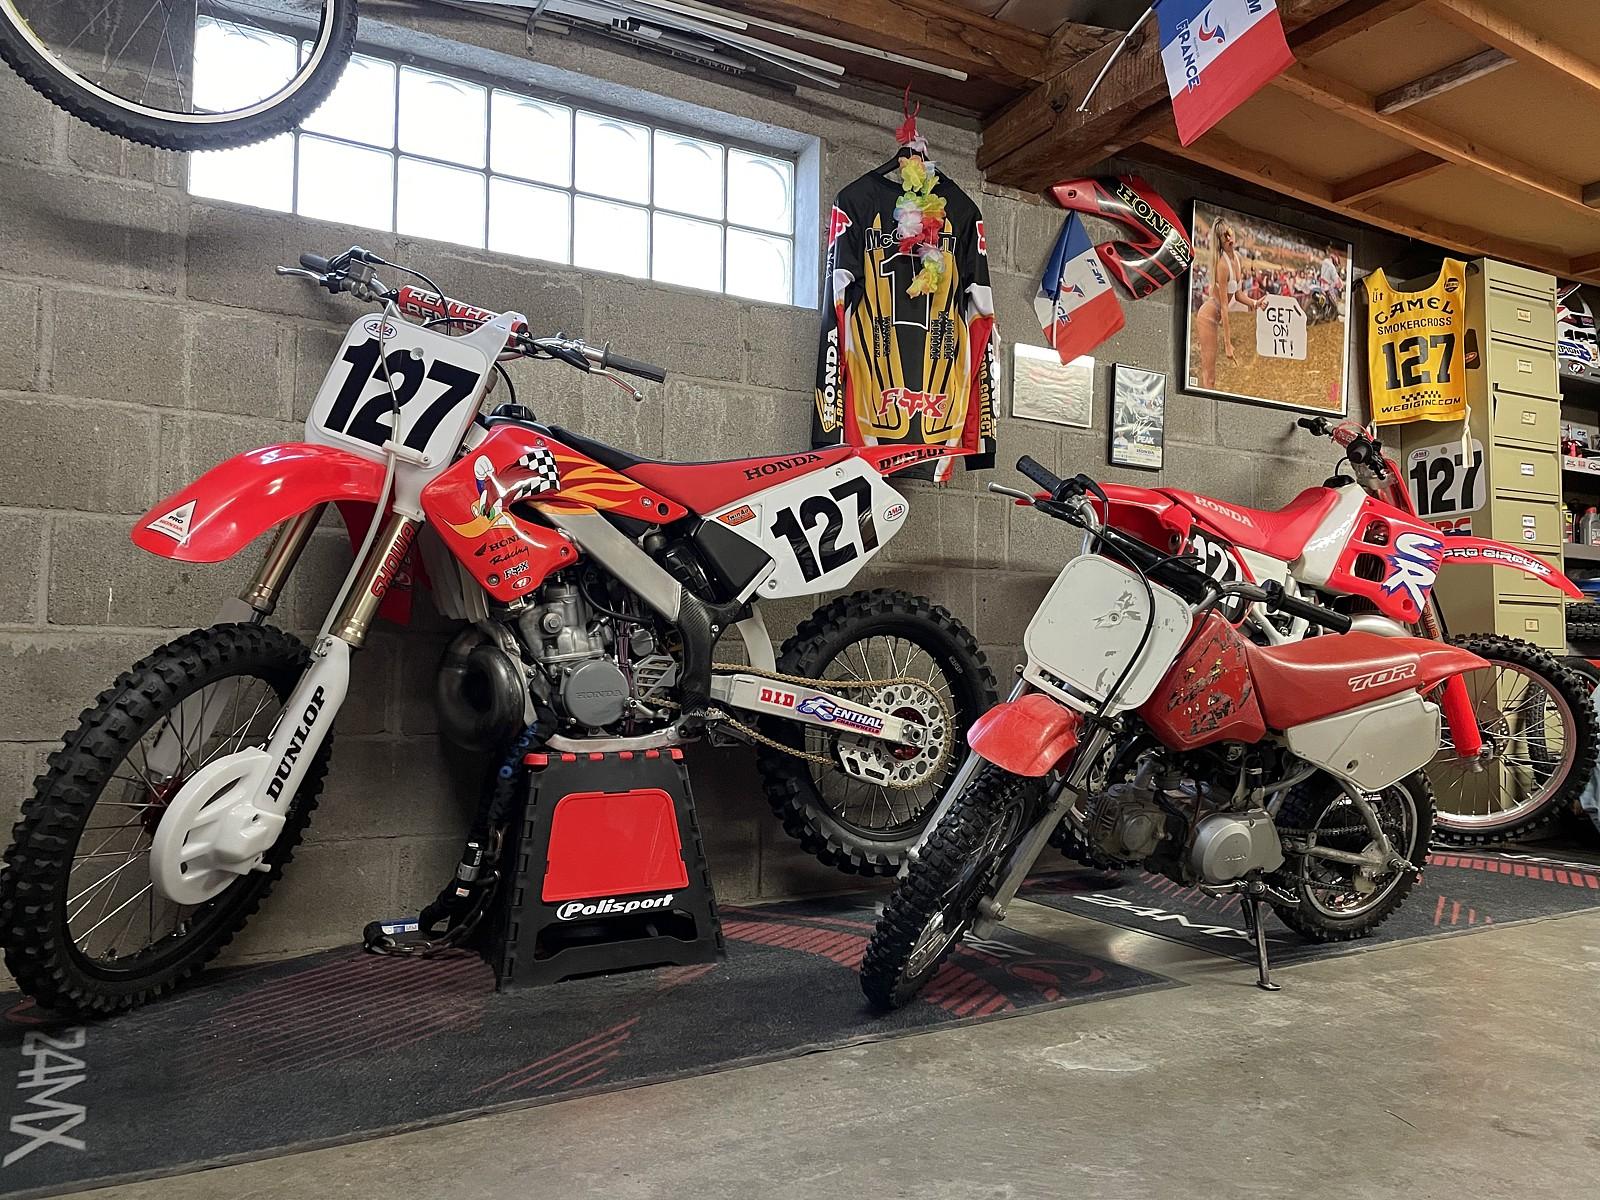 30F69537-1912-467E-82A2-5B6F36A39B41 - Godcho - Motocross Pictures - Vital MX